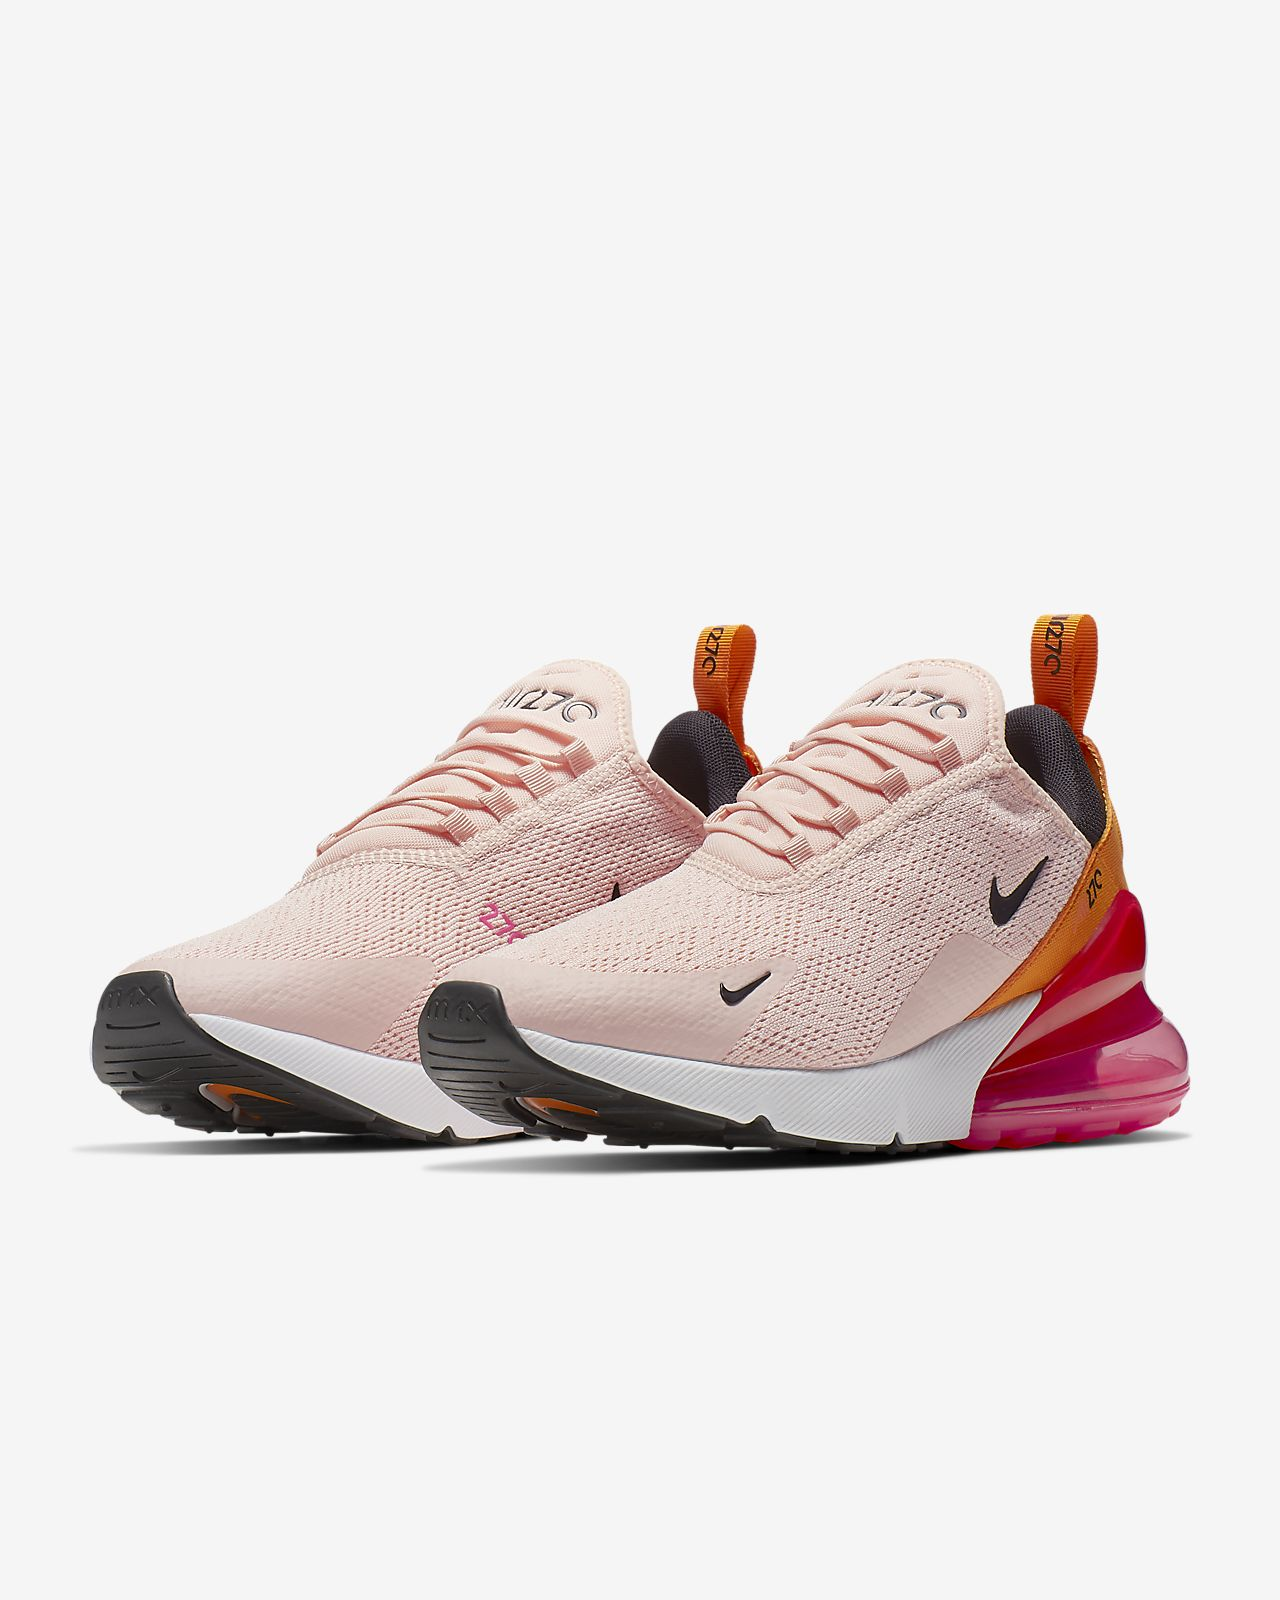 official photos a7a37 4f2e2 Chaussure Nike Air Max 270 pour Femme. Nike.com BE